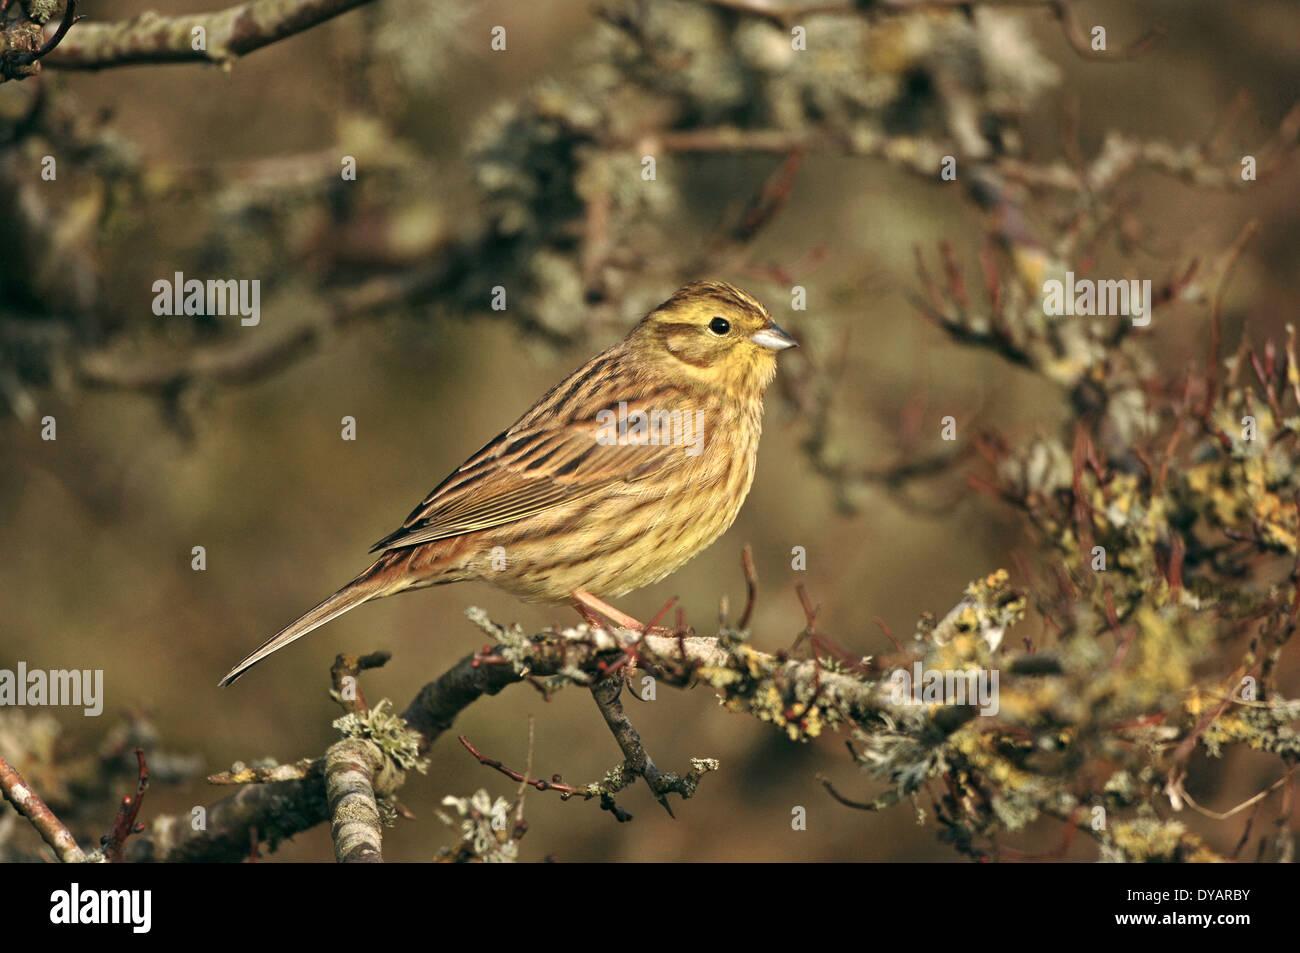 Yellowhammer - Emberiza citrinella - winter female/1st winter - Stock Image